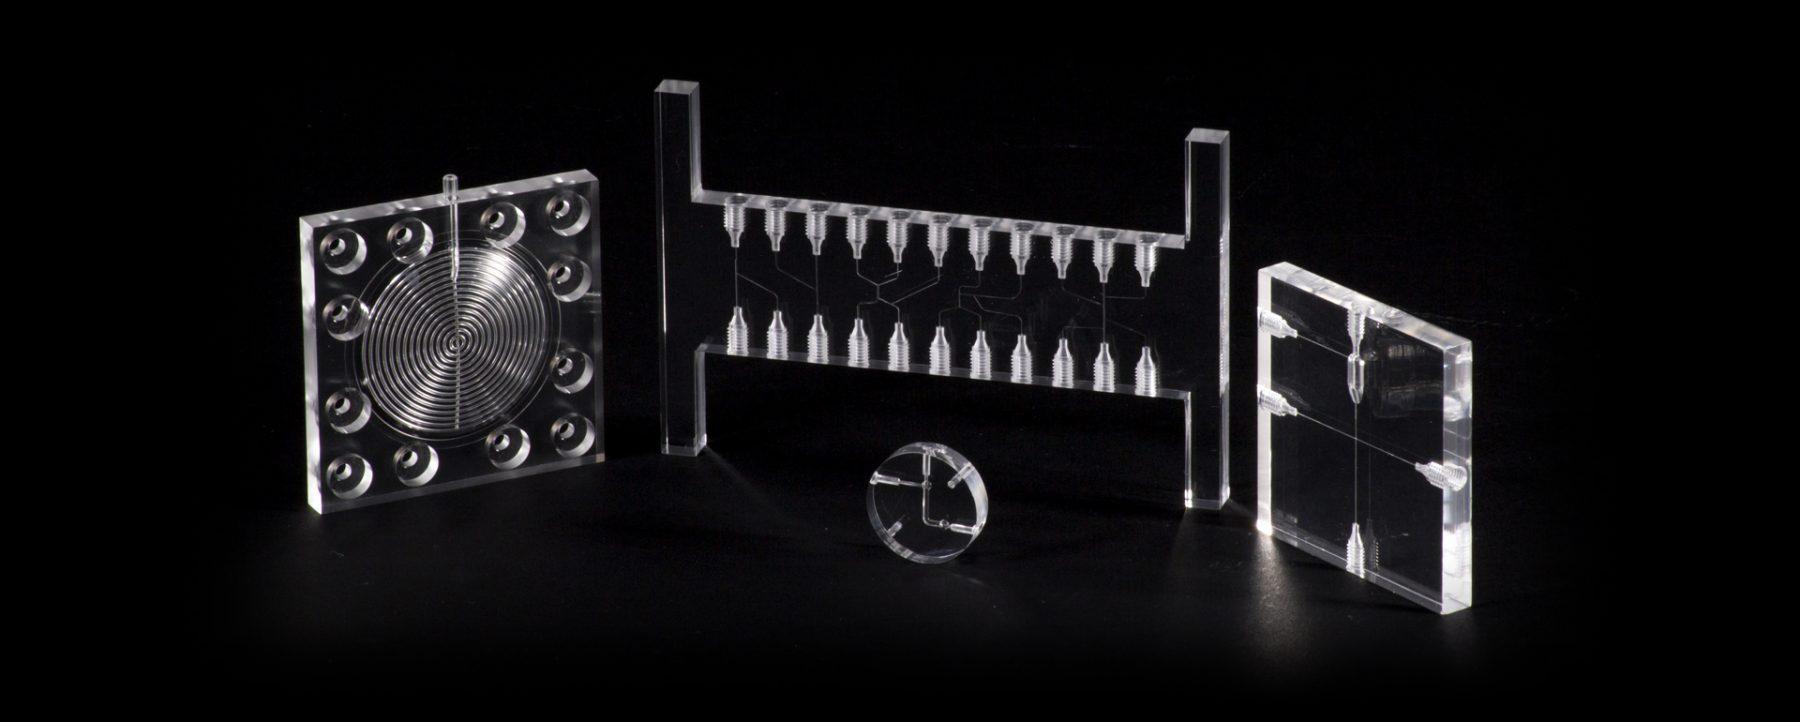 micro fluidic manifolds and micro fluidic manifold chips